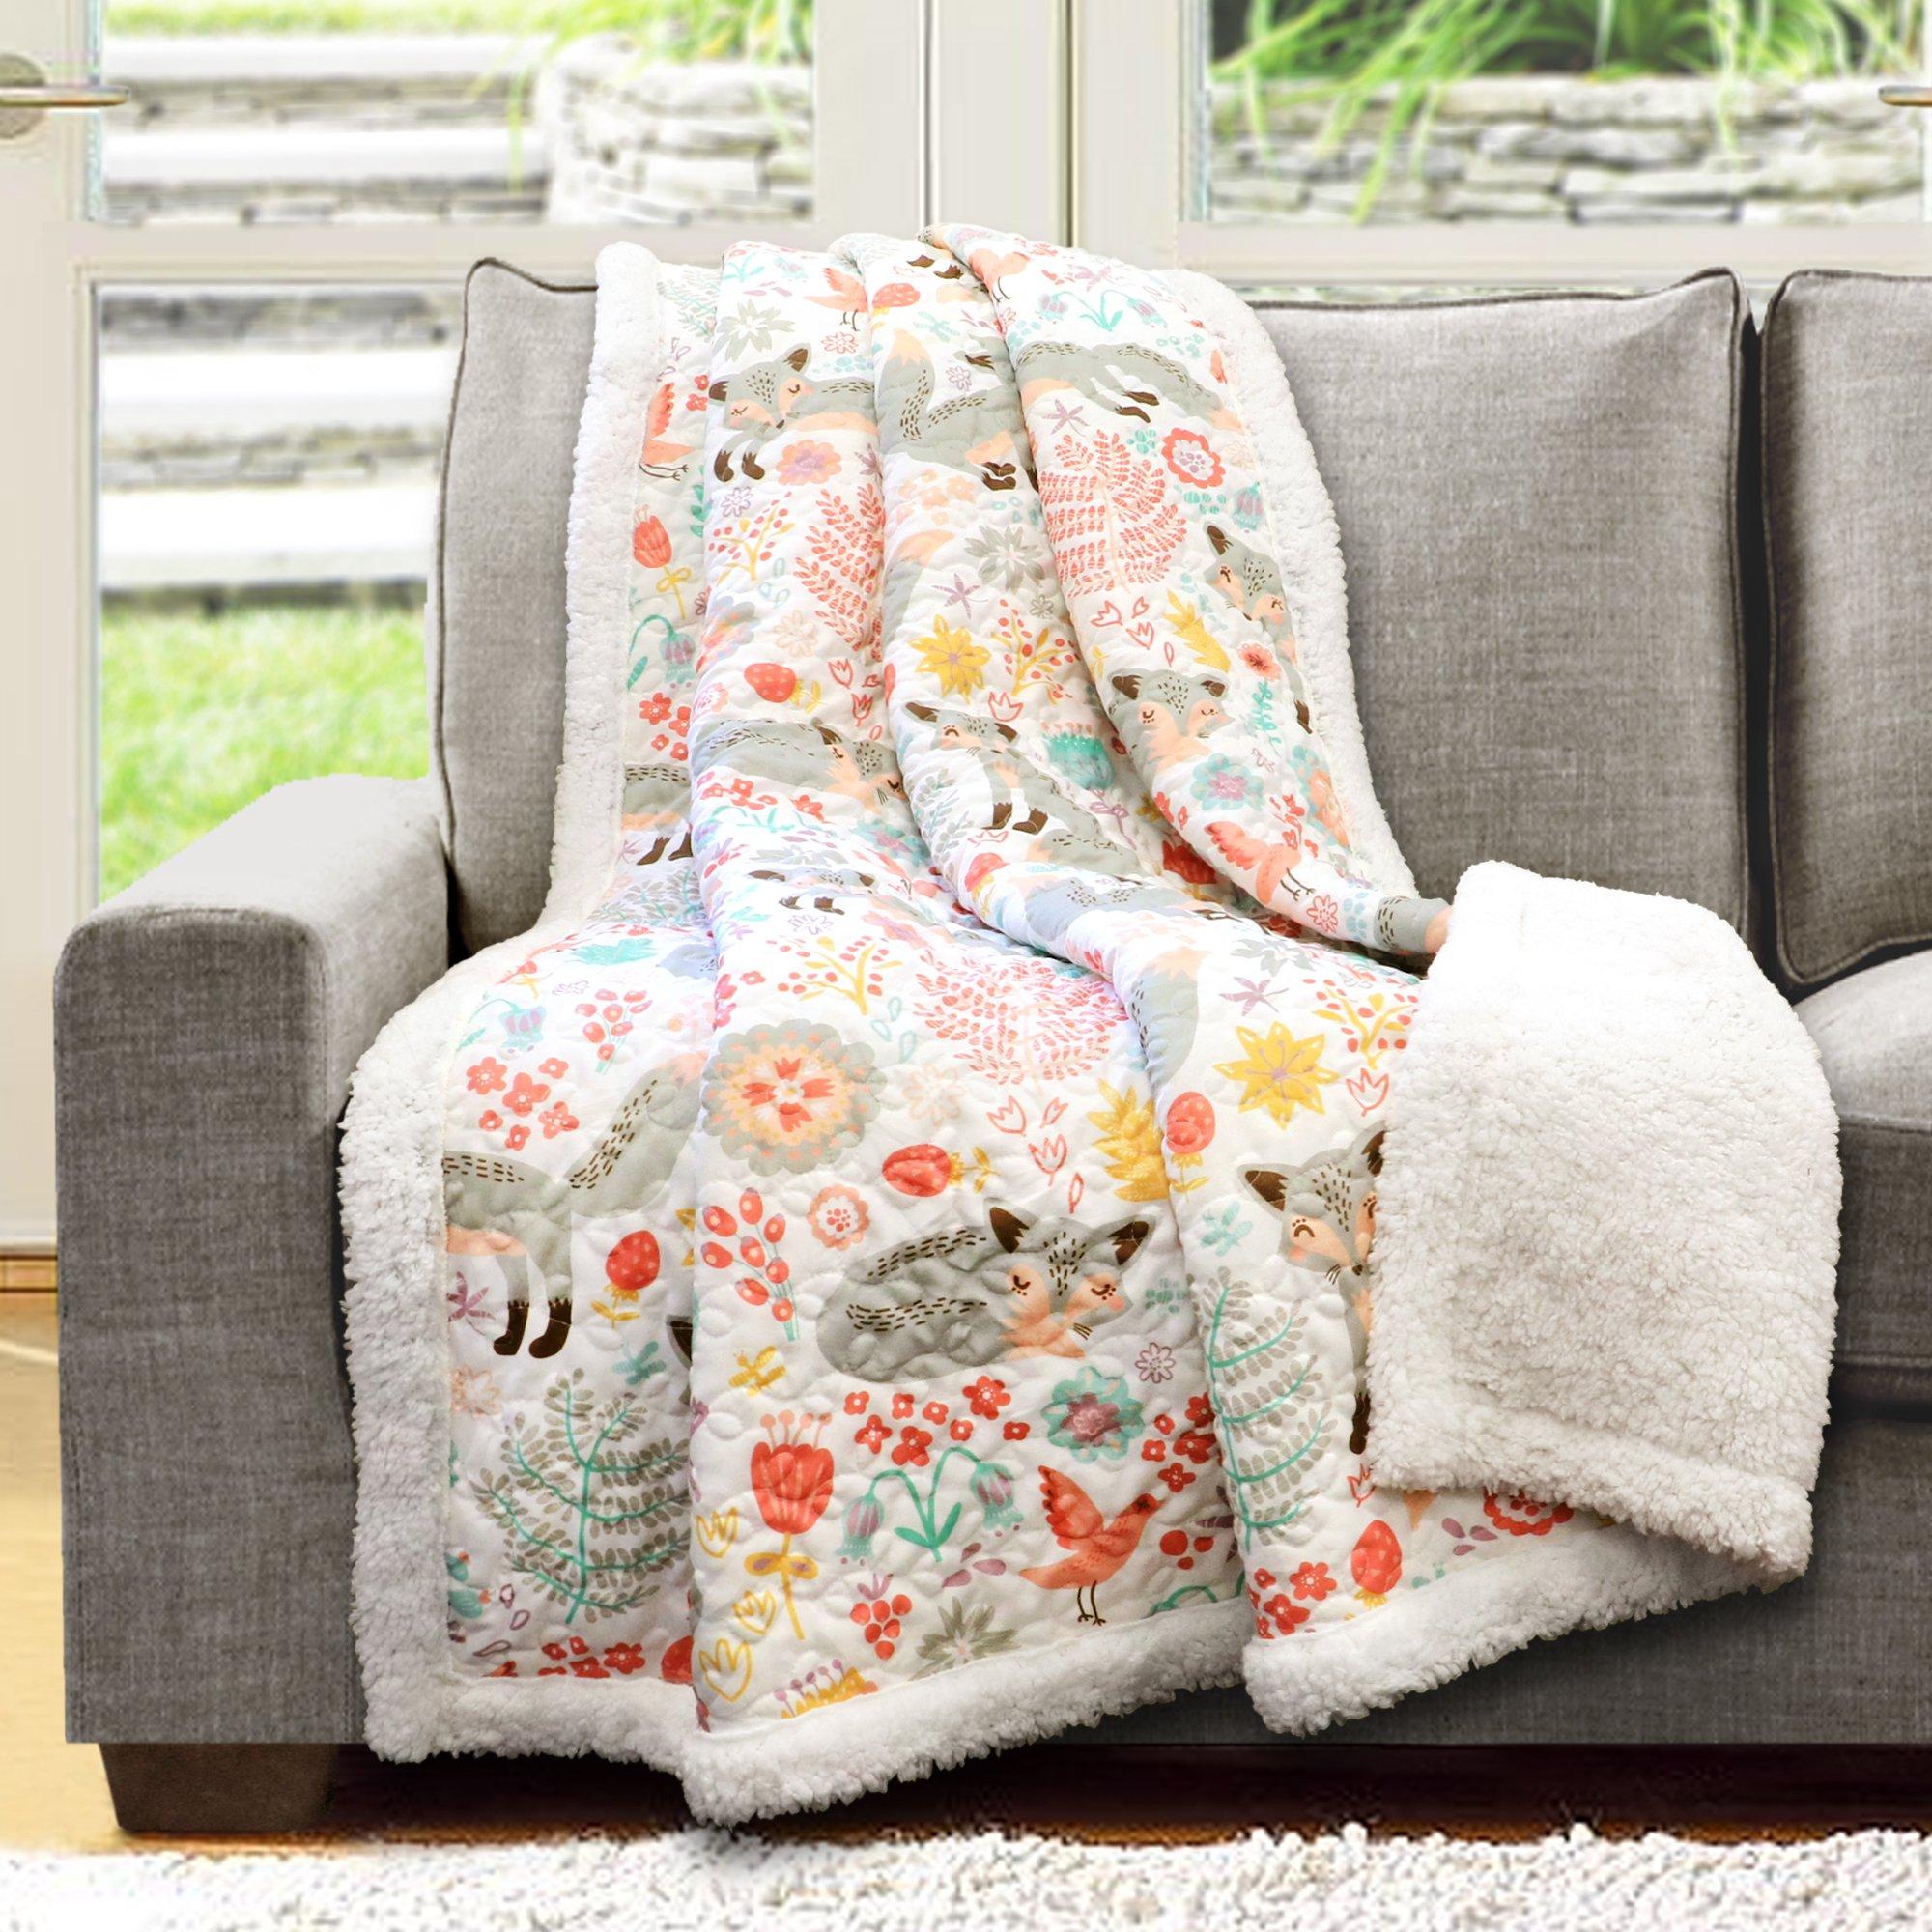 Lush Decor Pixie Fox Throw Fuzzy Reversible Sherpa Blanket, 60'' x 50'', Gray & Pink